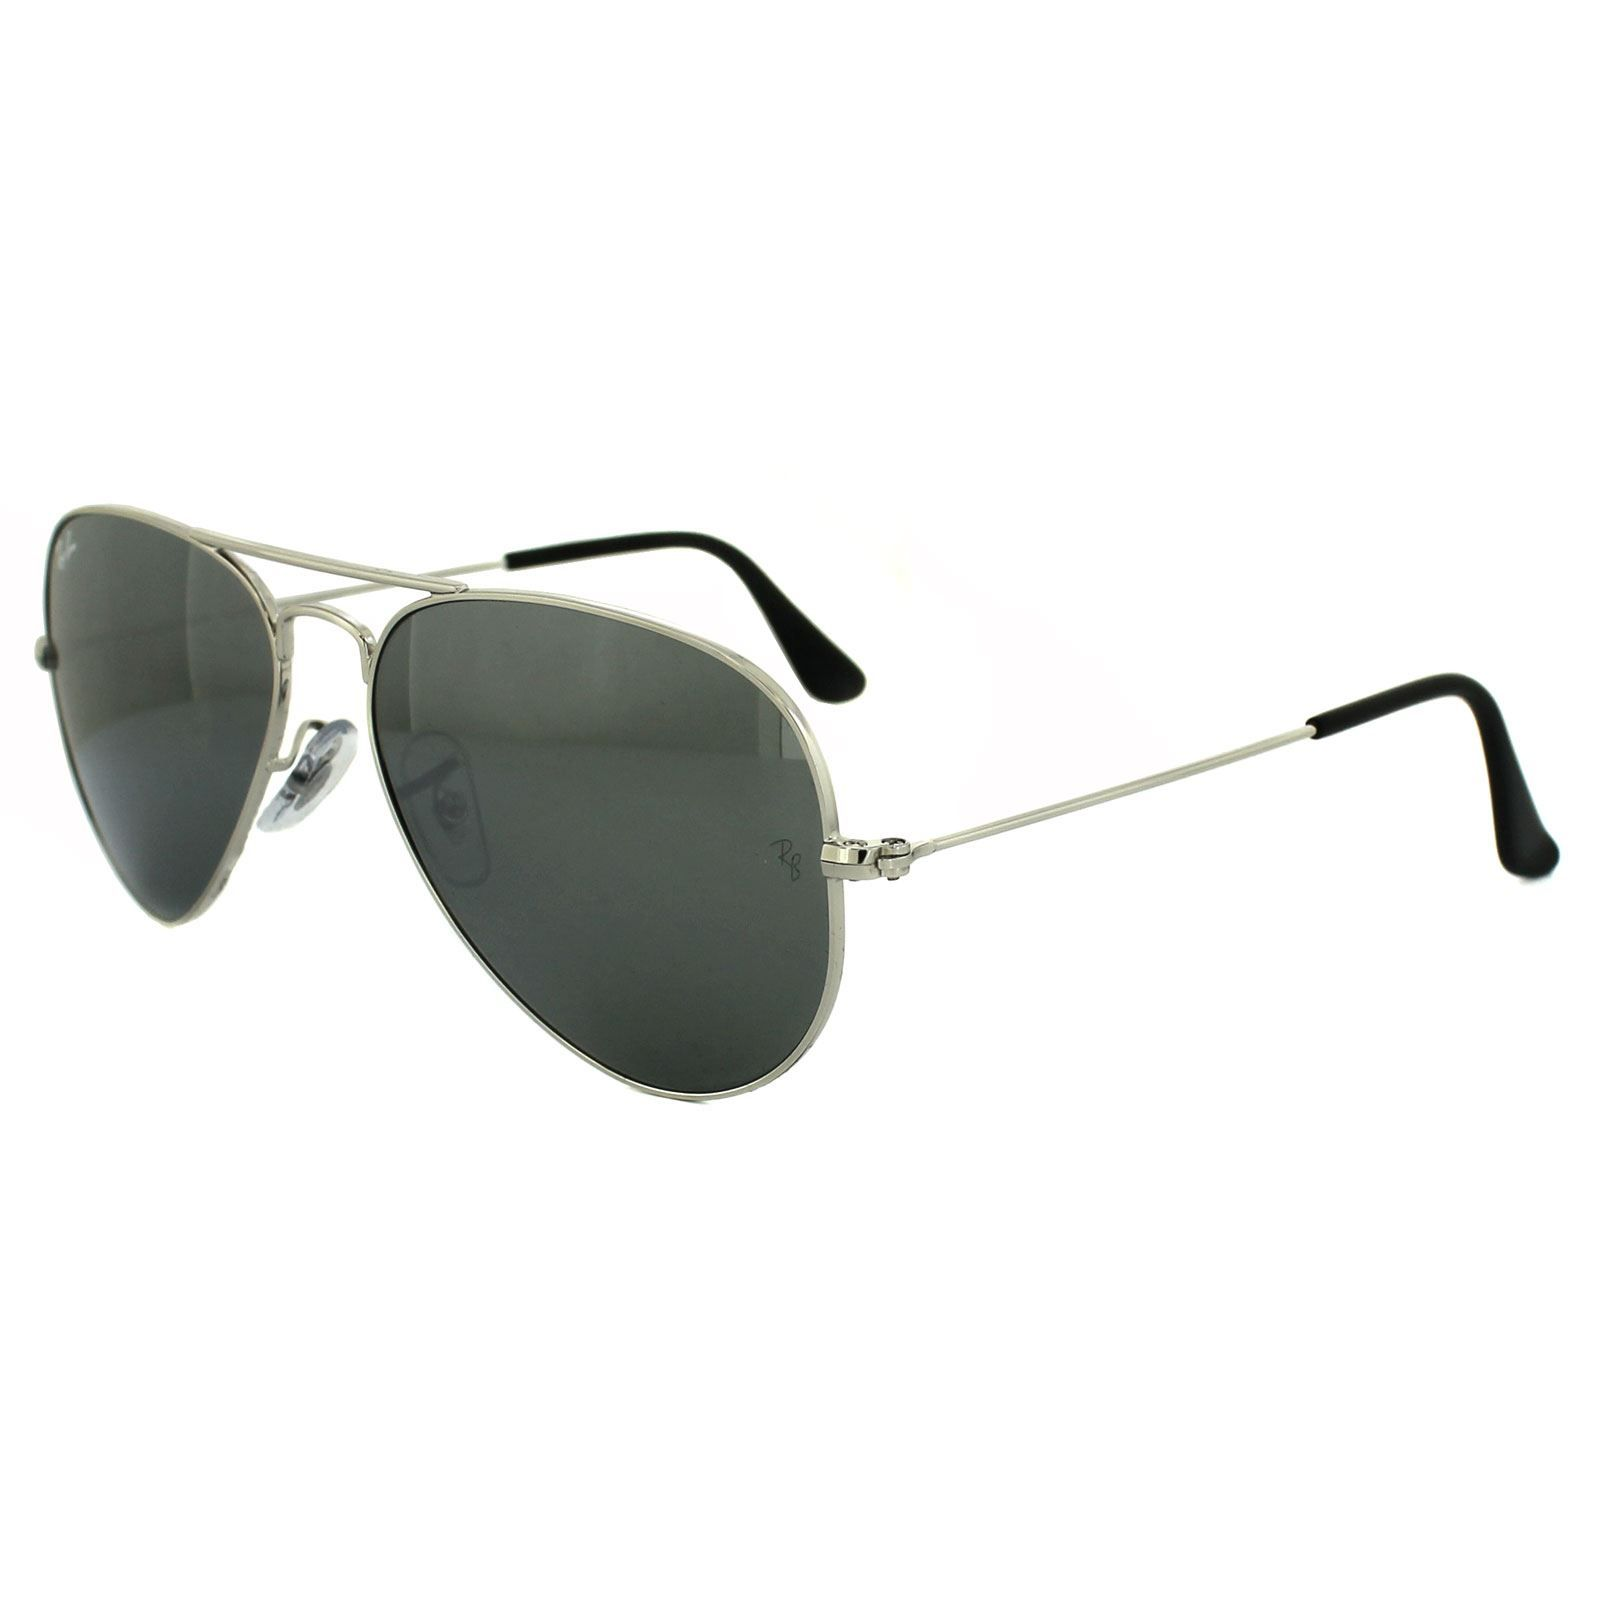 Ray-Ban Sunglasses Aviator 3025 W3275 Silver Grey Mirror 55mm